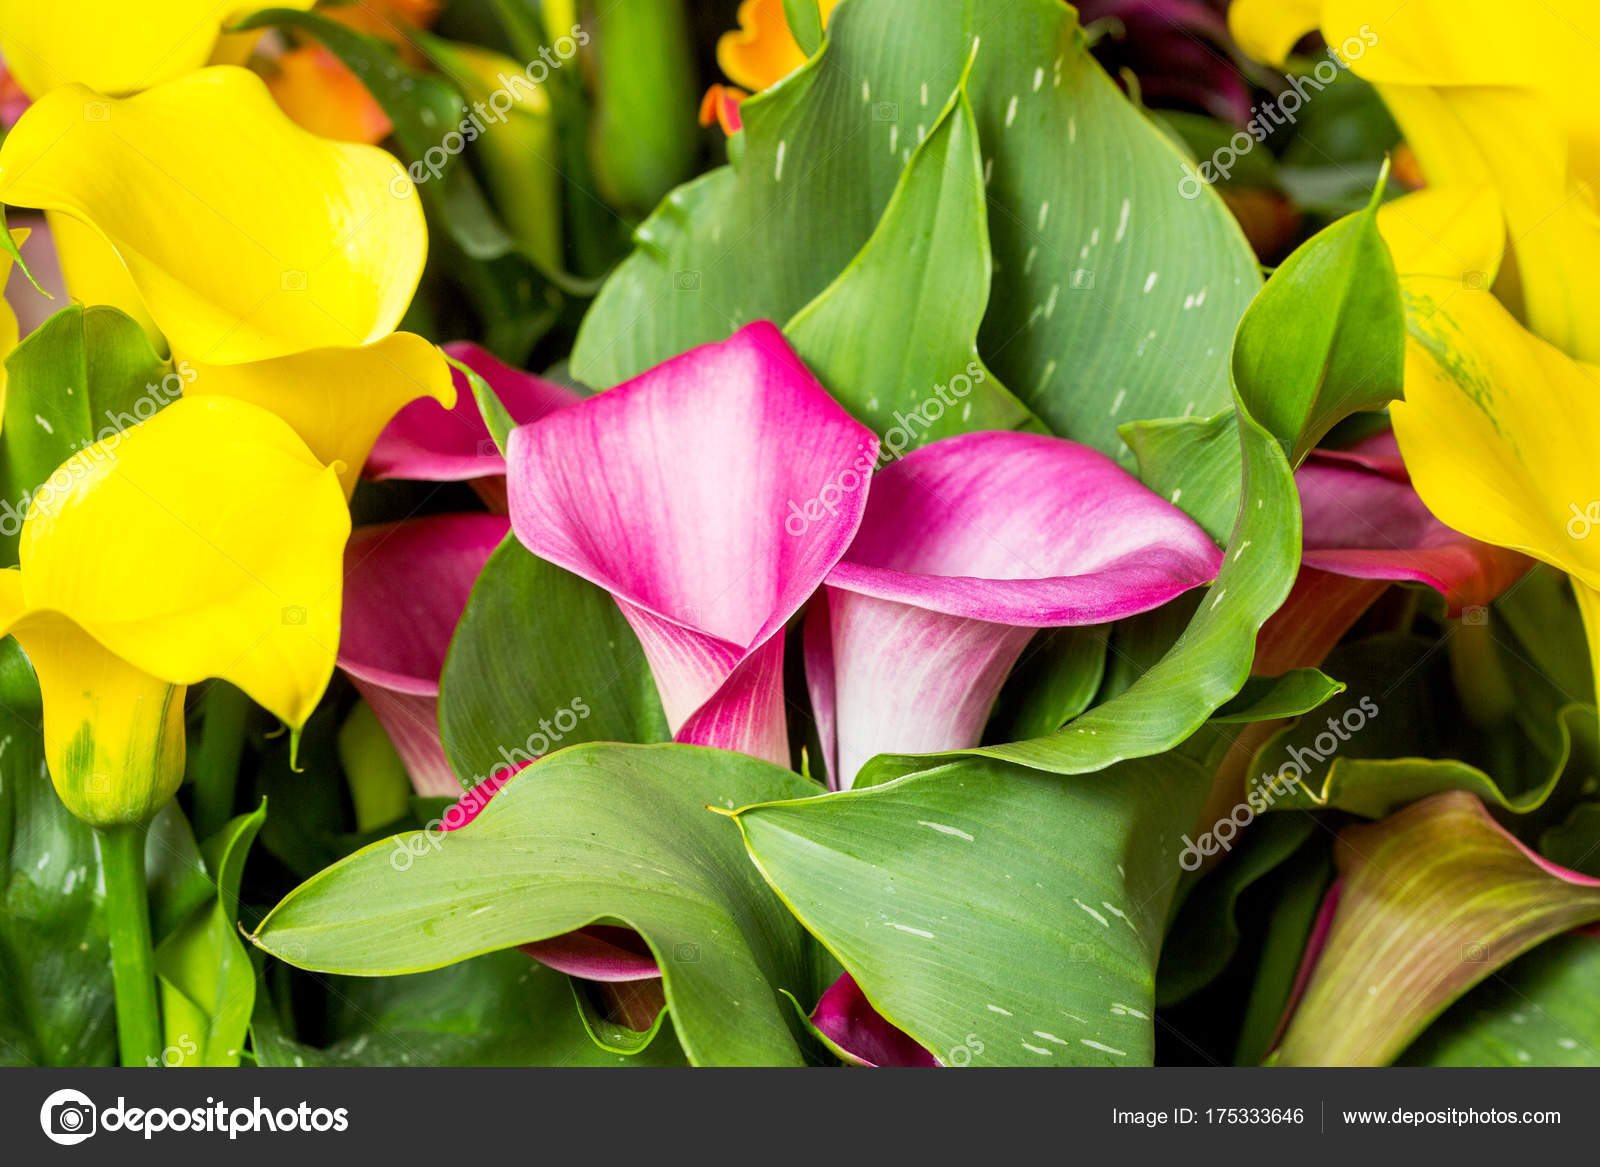 Beautiful multi colored calla lily flowers in garden stock photo beautiful multi colored calla lily flowers in garden stock photo izmirmasajfo